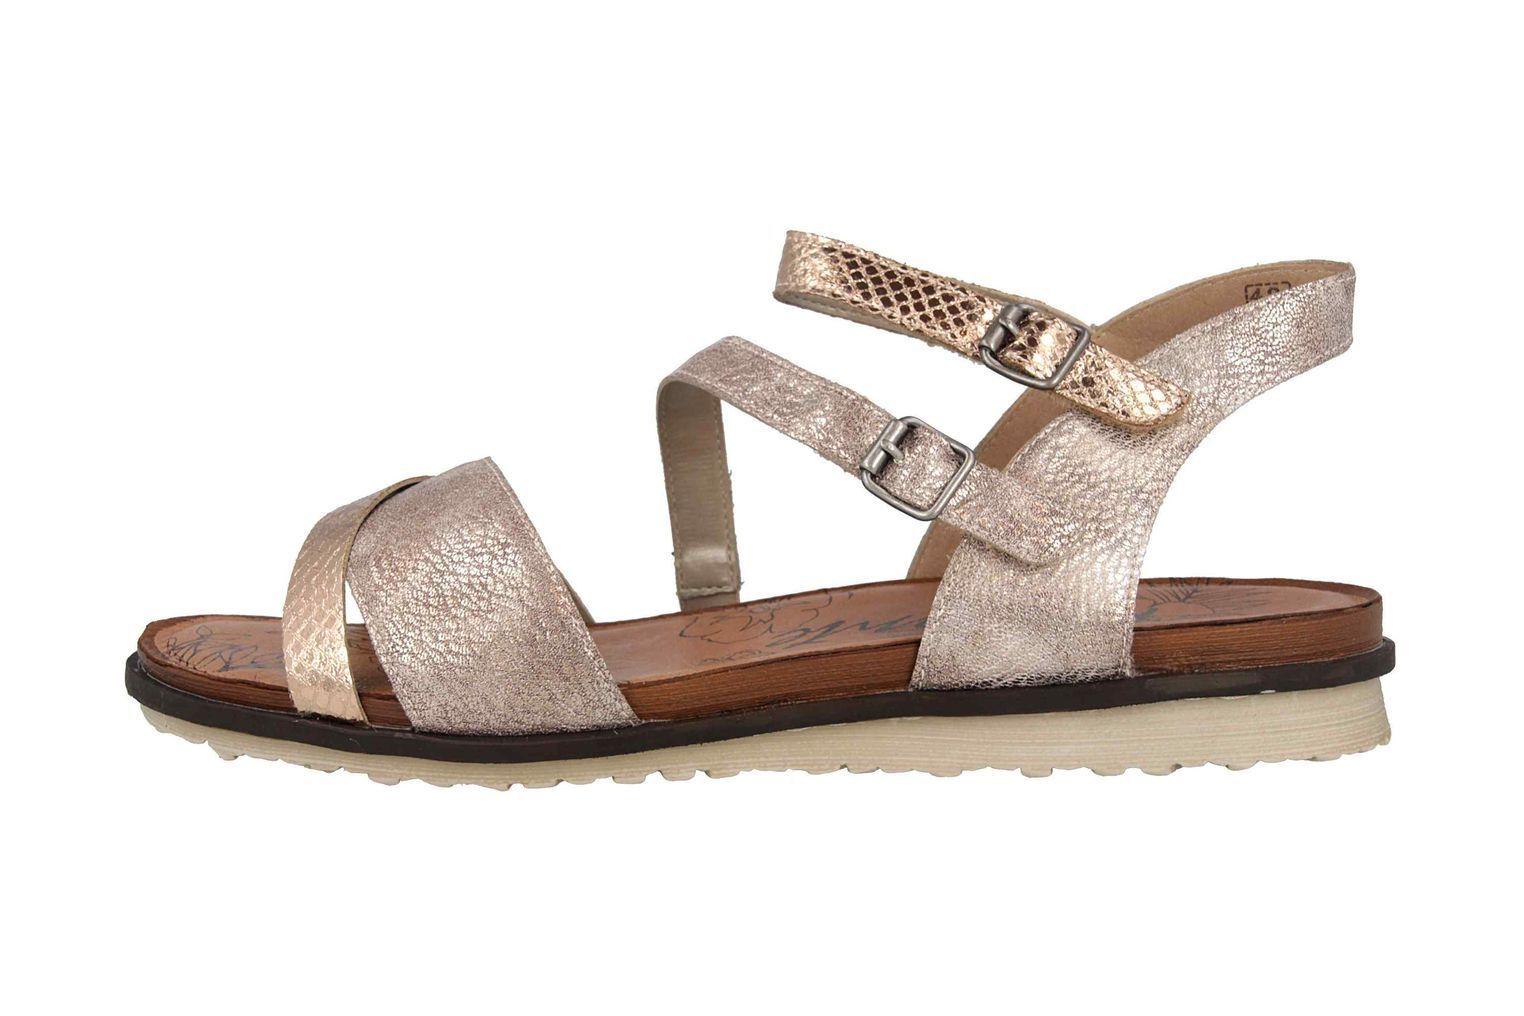 Remonte Sandales en Grande Taille Rose r2750-31 Grand Chaussures Femmes